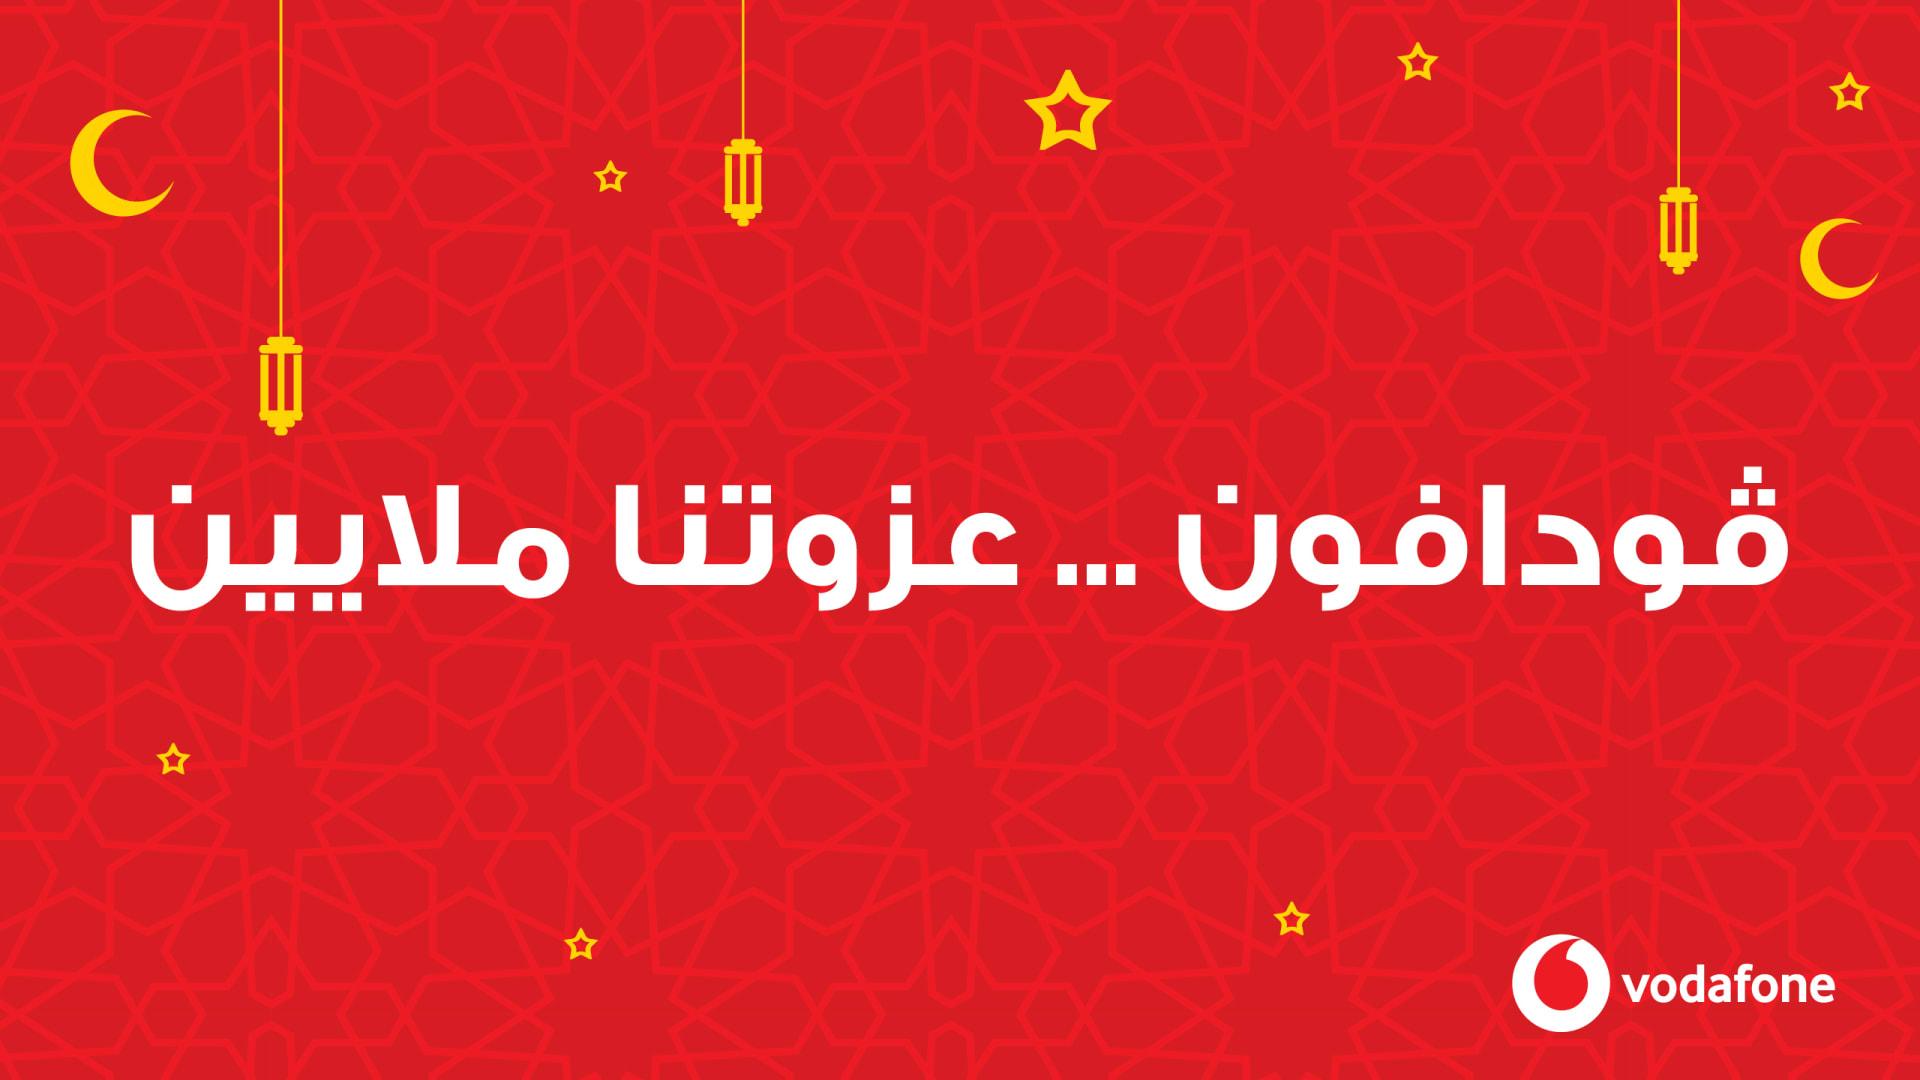 WT Cairo VF Egypt Ramadan 2020 HERO SHOT USE THIS ONE